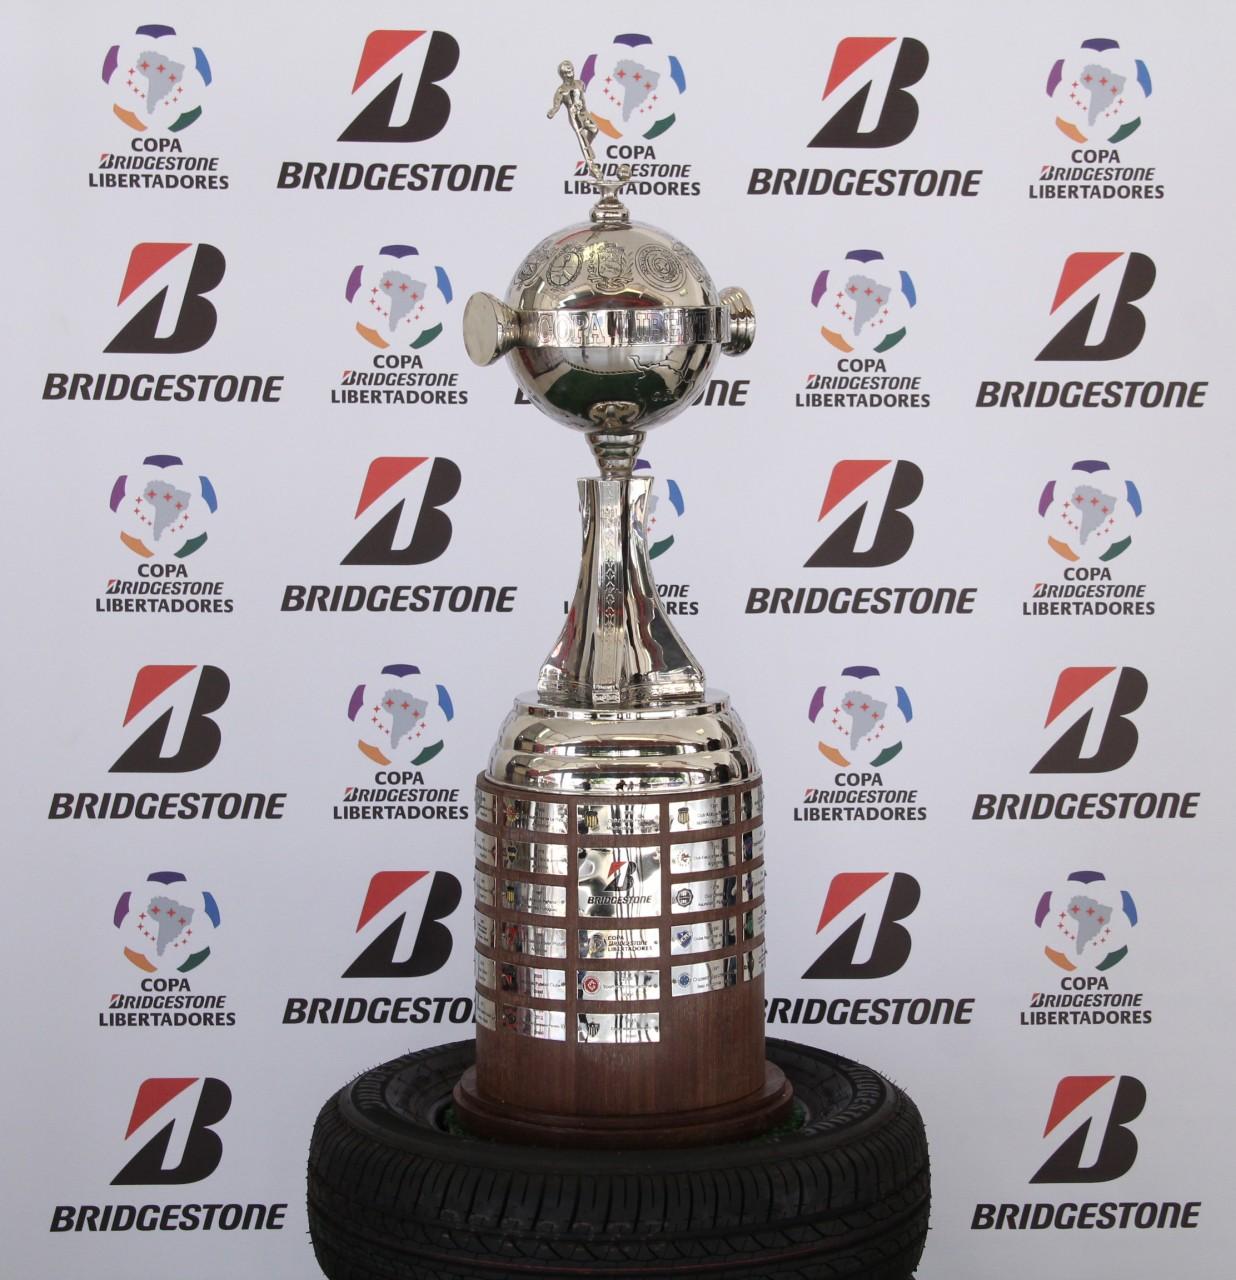 Troféu Copa Bridgestone Libertadores 2015